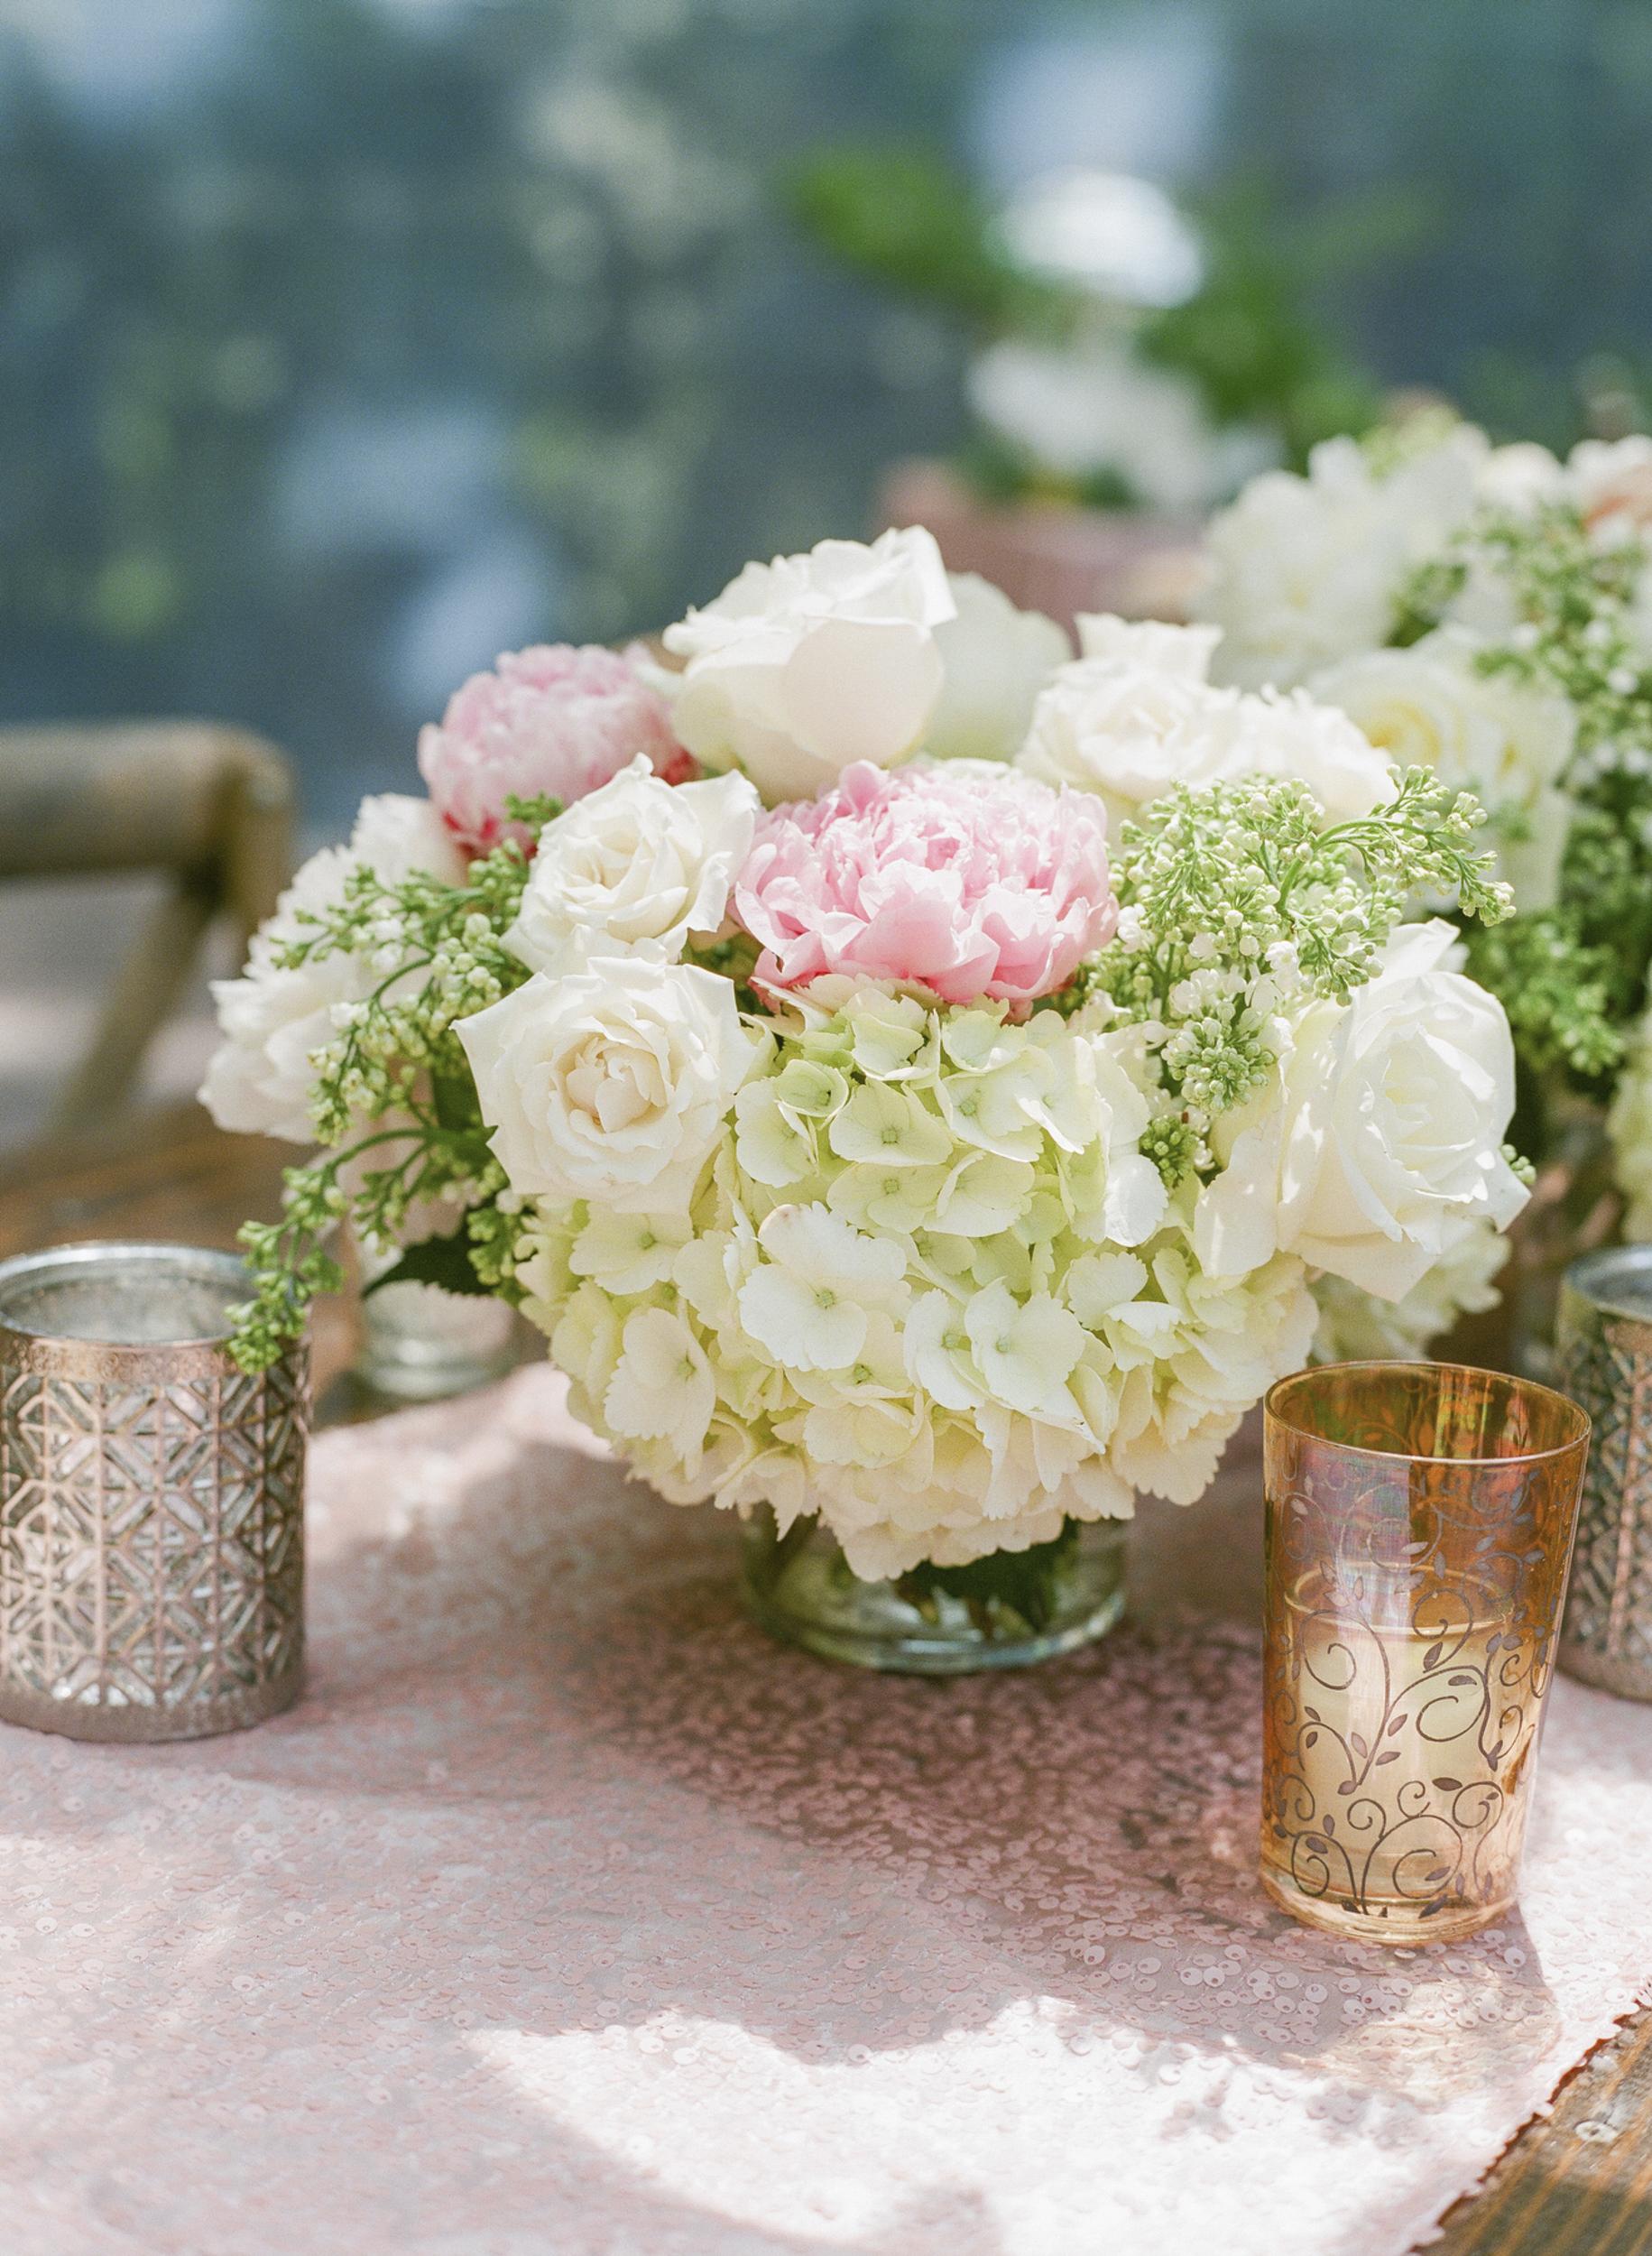 south_carolina_farm_wedding_rustic_chic_surprise_secret_luxe_wedding_bachelorette_emily_maynard_real_weddings-20.jpg